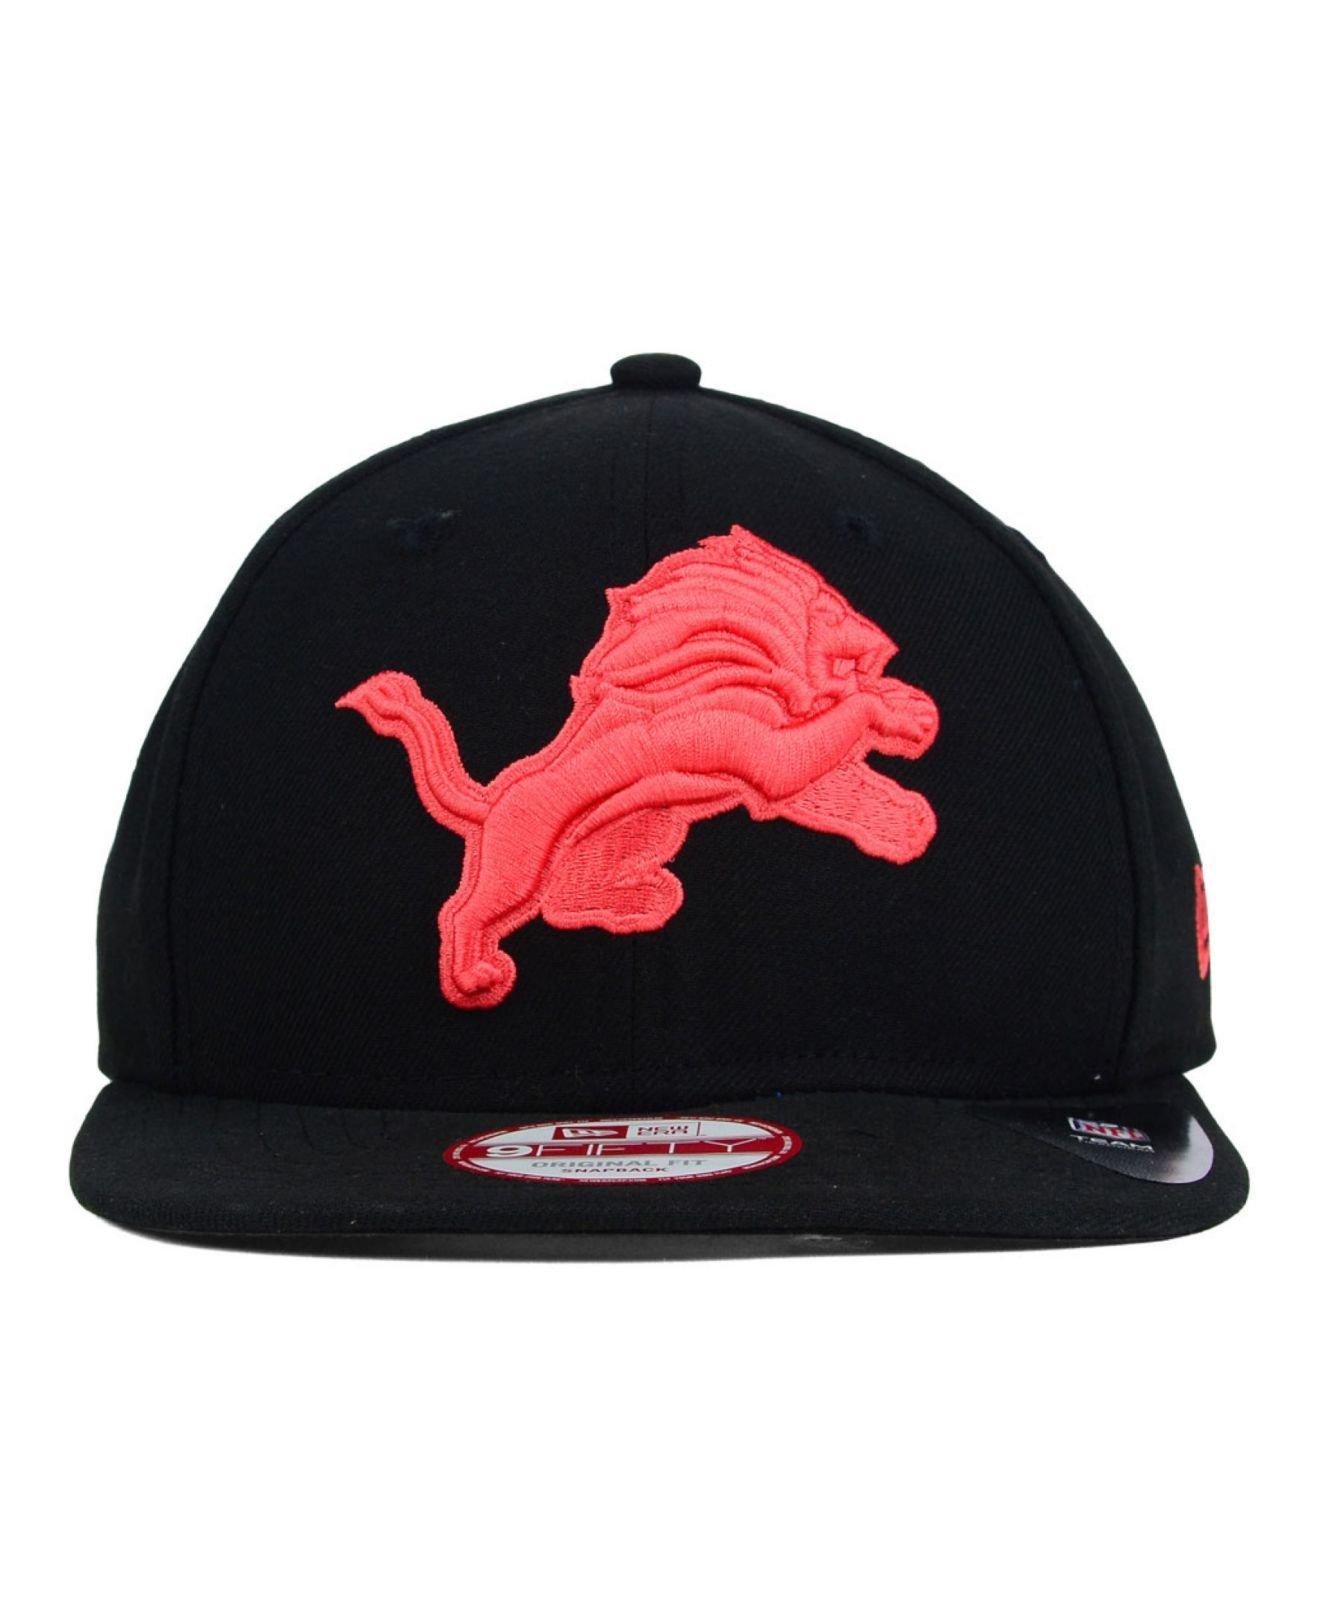 ... coupon lyst ktz detroit lions original fit 9fifty snapback cap in red  for men 2ba88 88290 39f6d668d